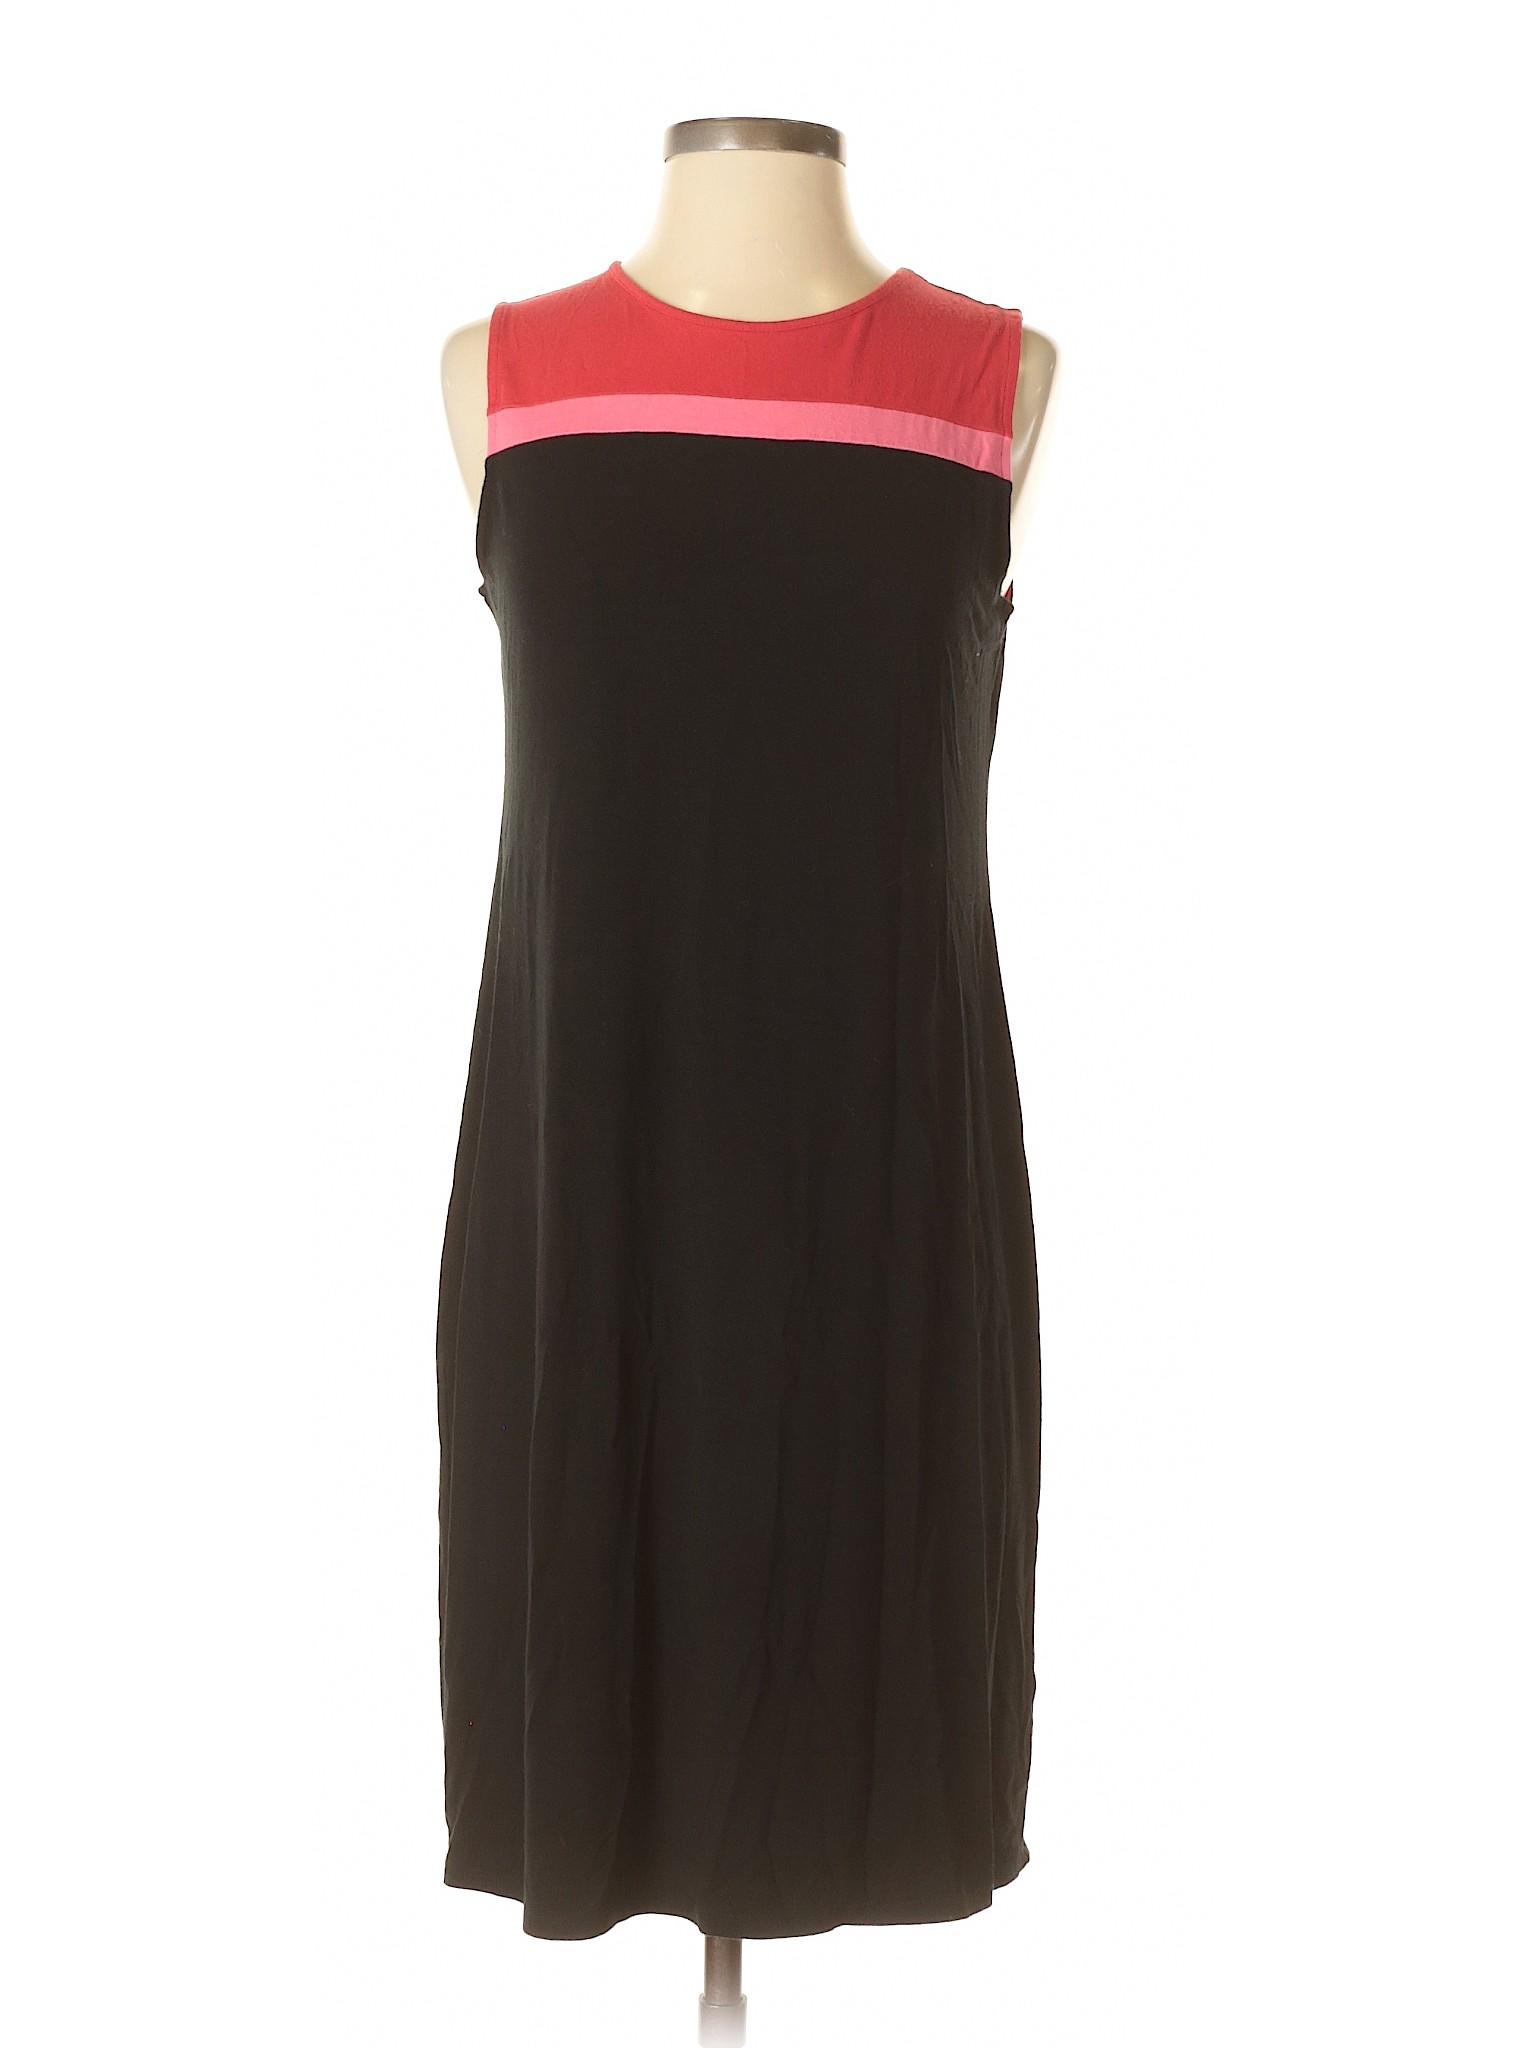 Casual Dress winter J jill Boutique SqYBnR